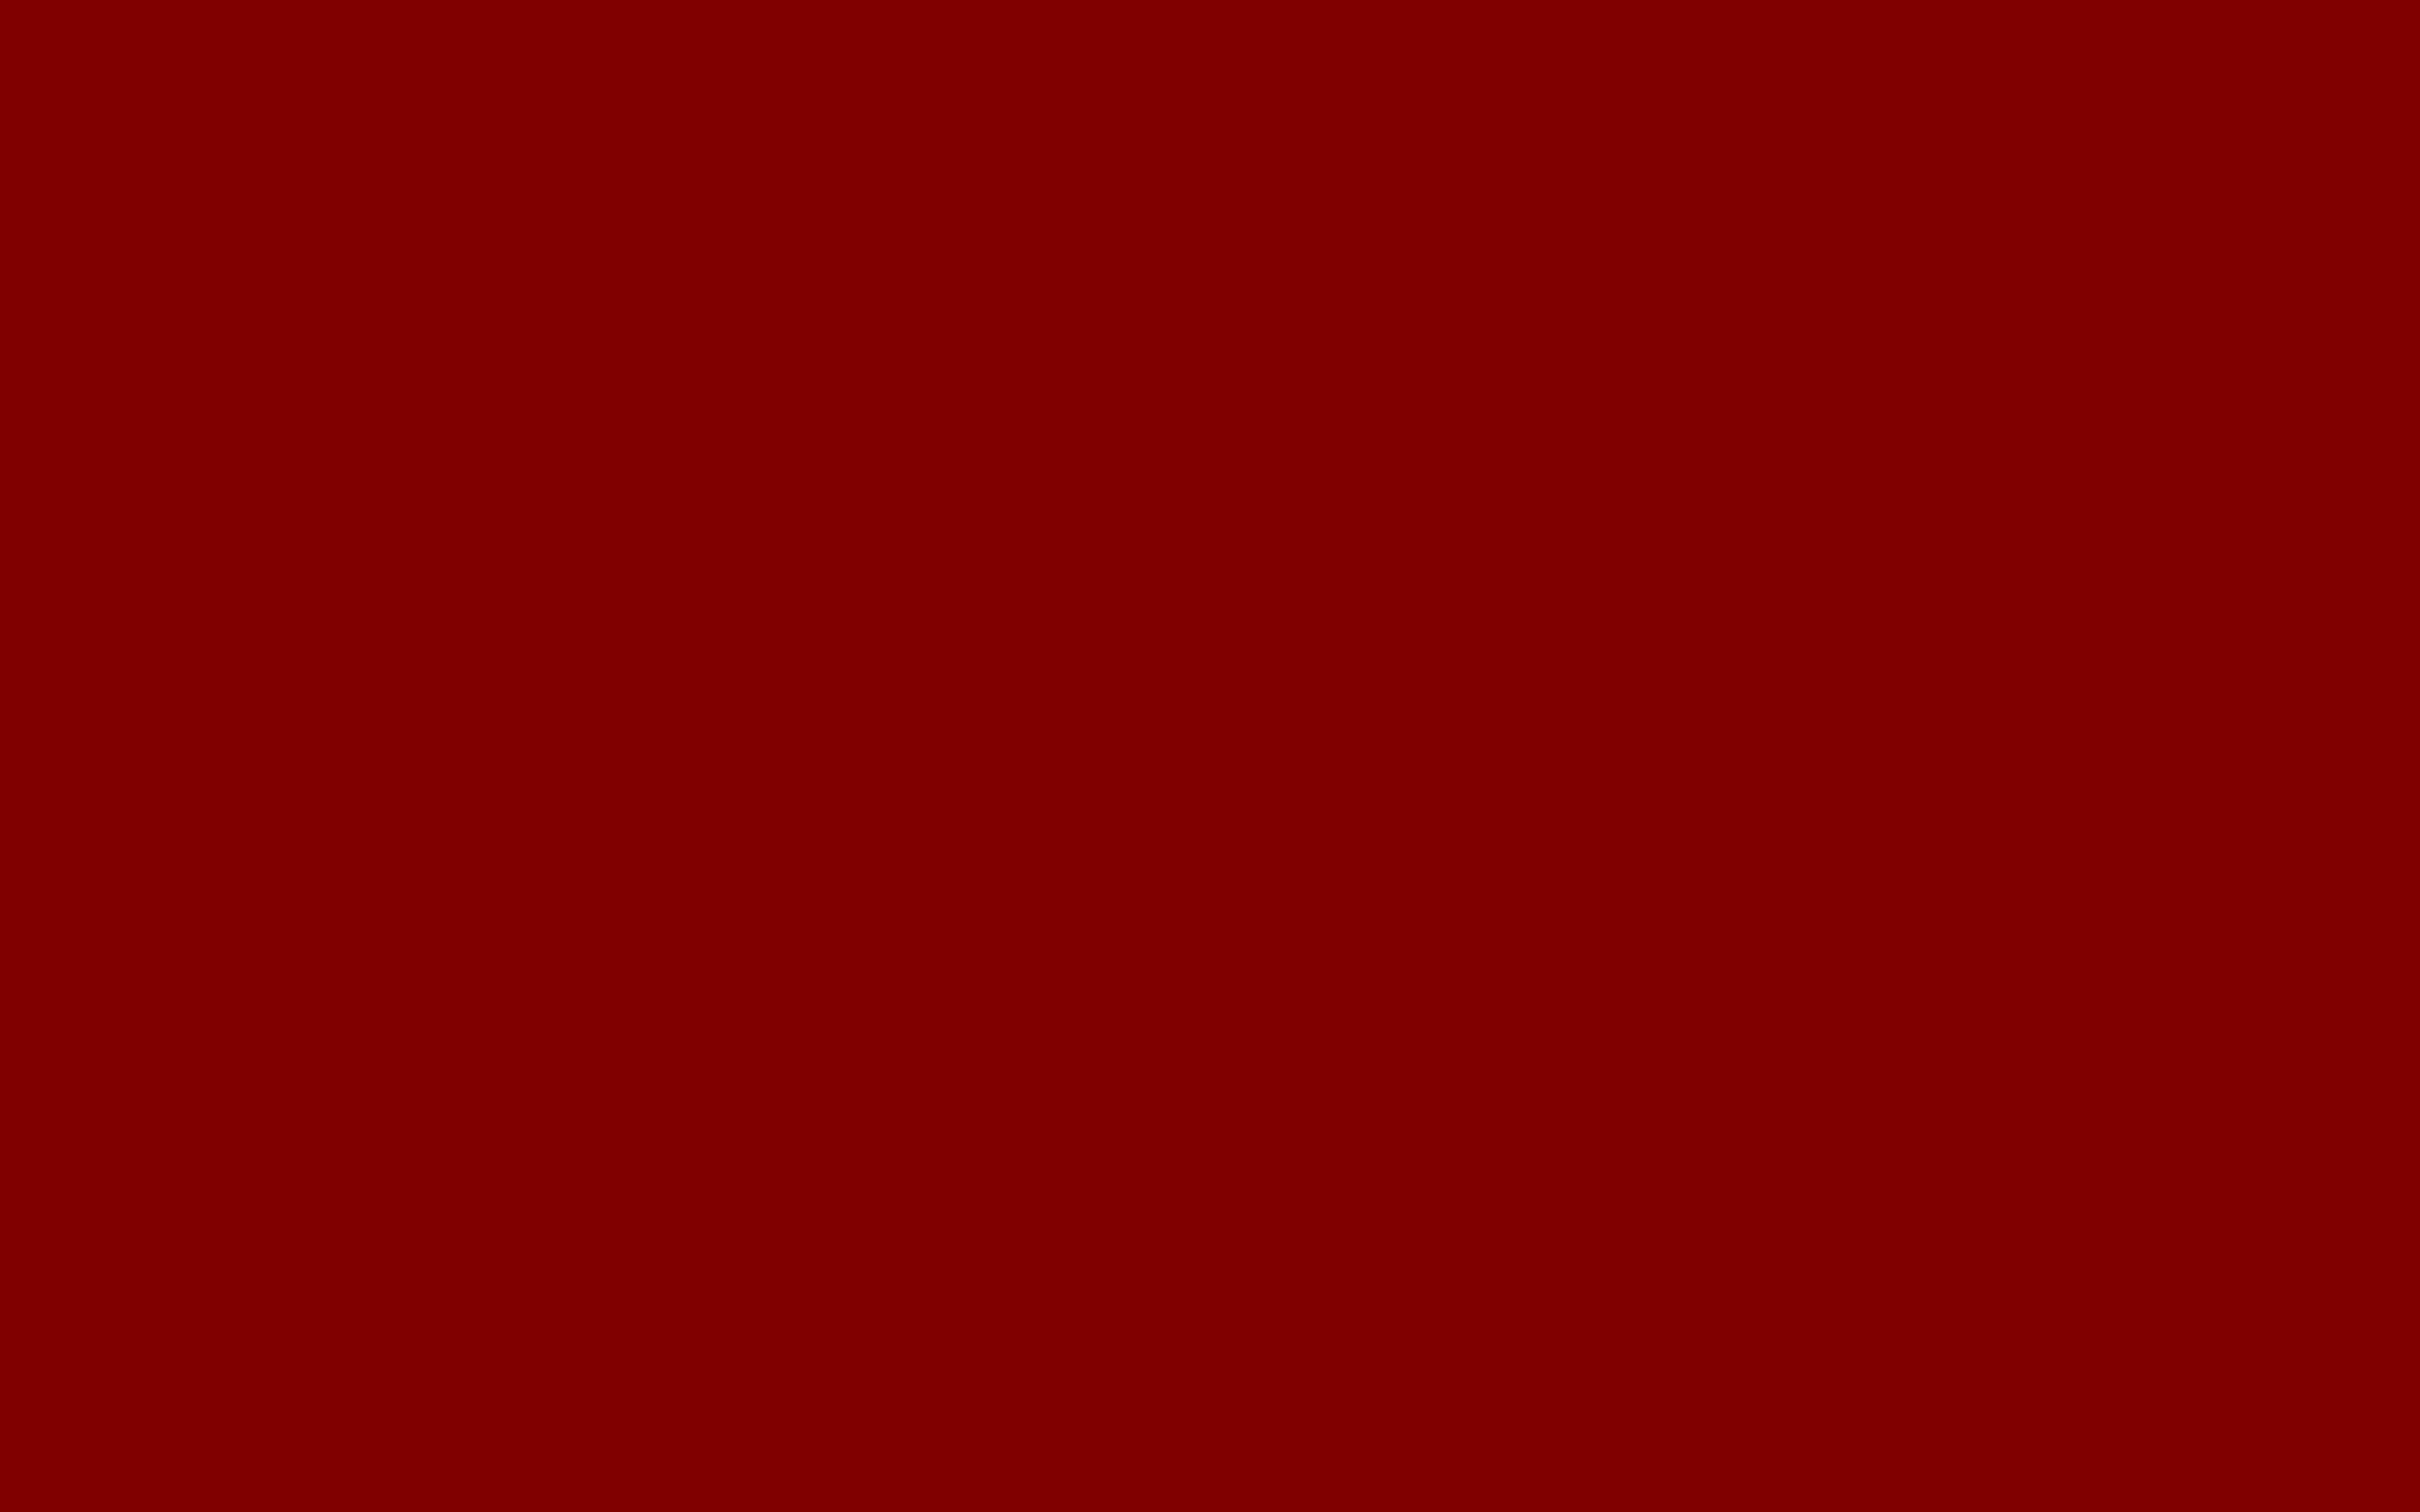 Solid Color Wallpaper Background 49777